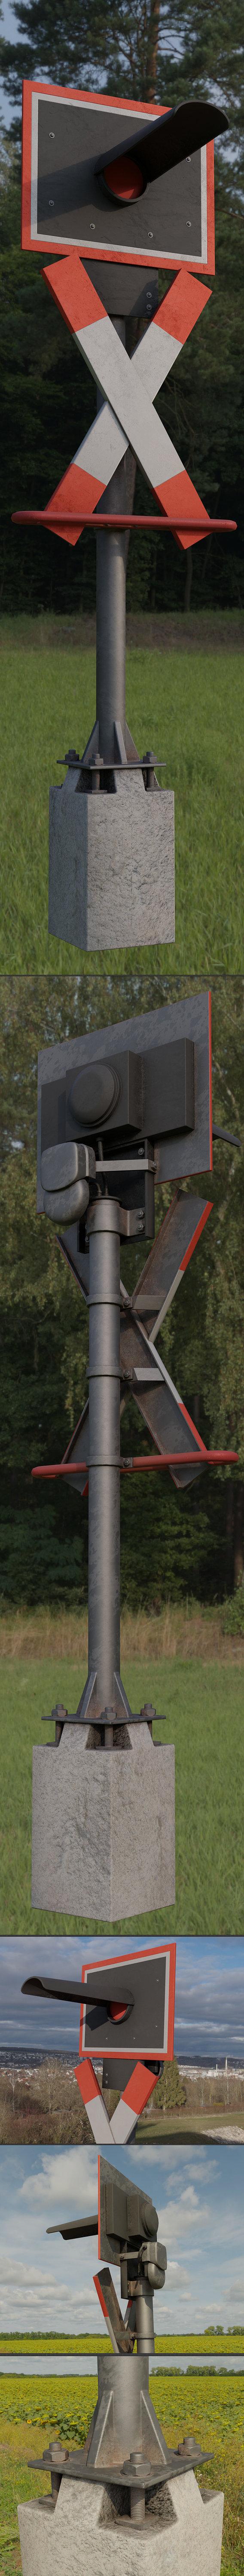 Low-Poly and PBR-Textured Andreaskreuz Version 1 (Blender-2.92 Eevee)